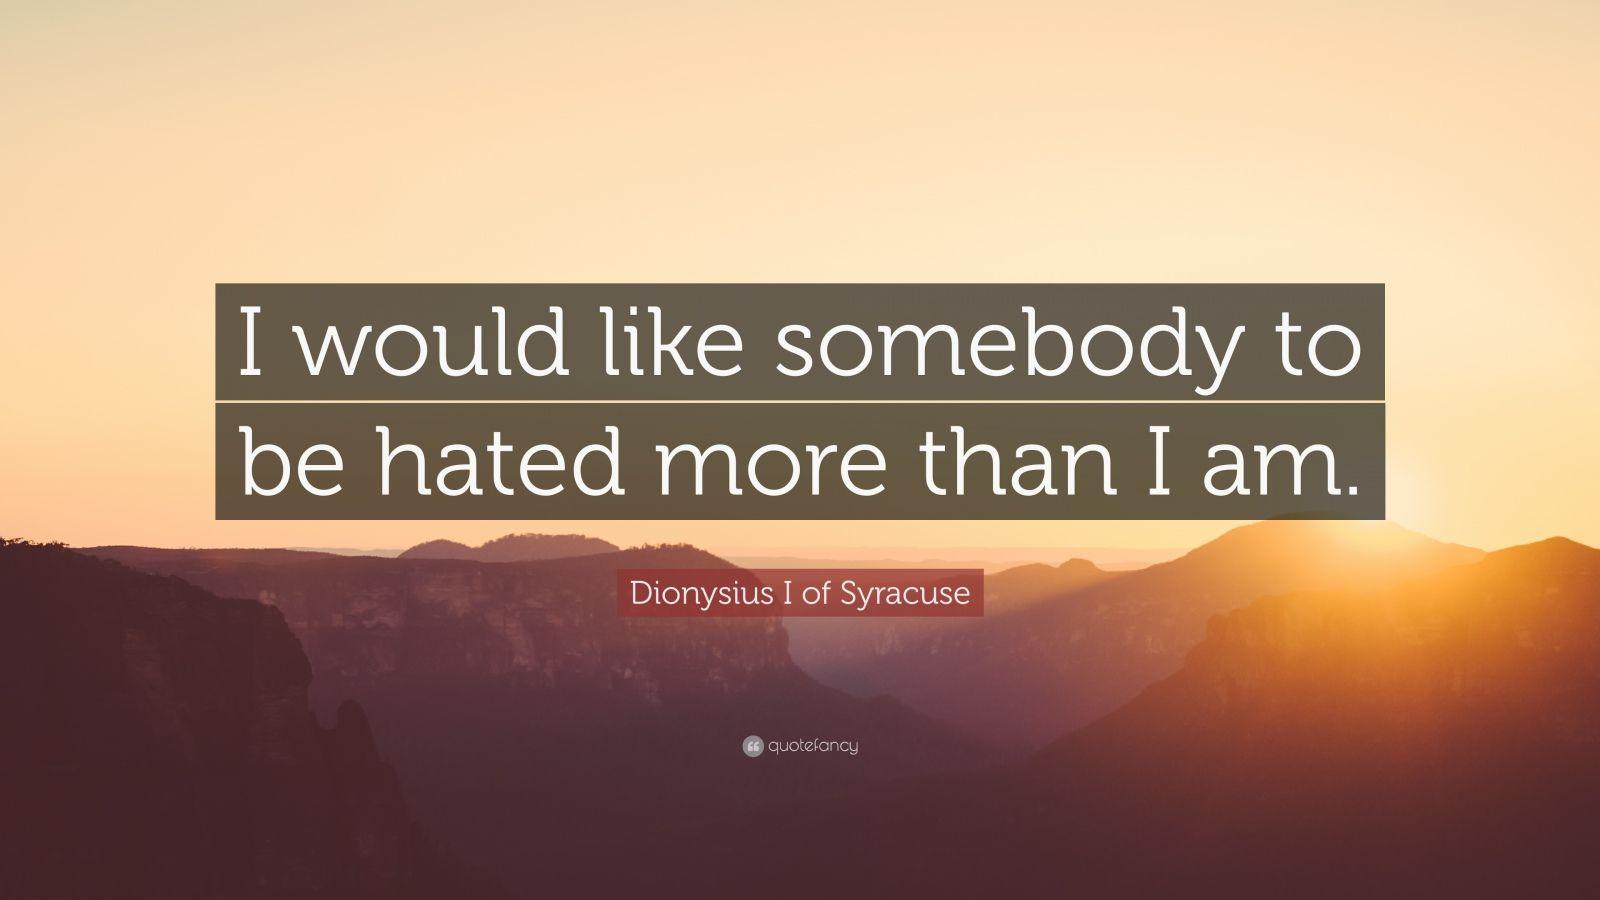 Top 2 Dionysius I of Syracuse Quotes | 2021 Edition | Free ...